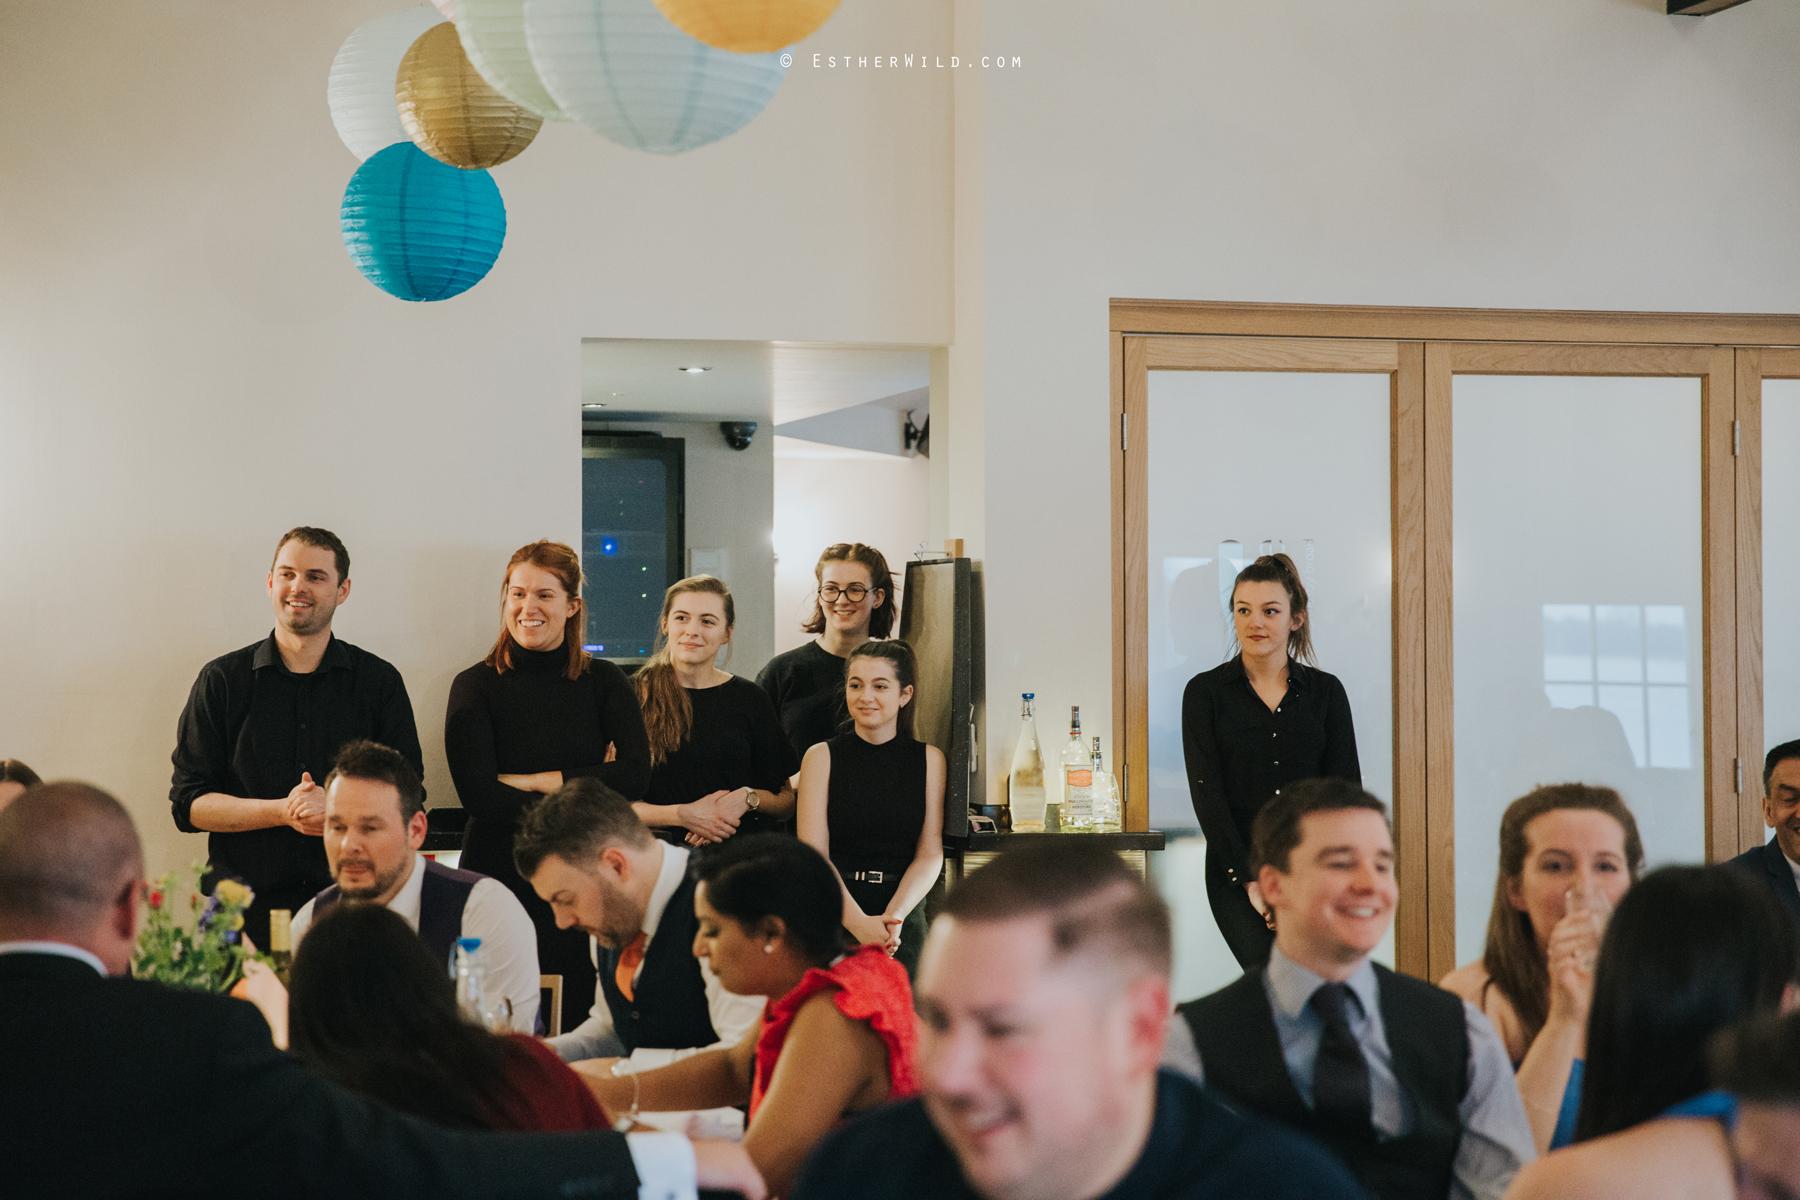 The_BoatHouse_Wedding_Venue_Ormesby_Norfolk_Broads_Boat_Wedding_Photography_Esther_Wild_Photographer_IMG_2297.jpg